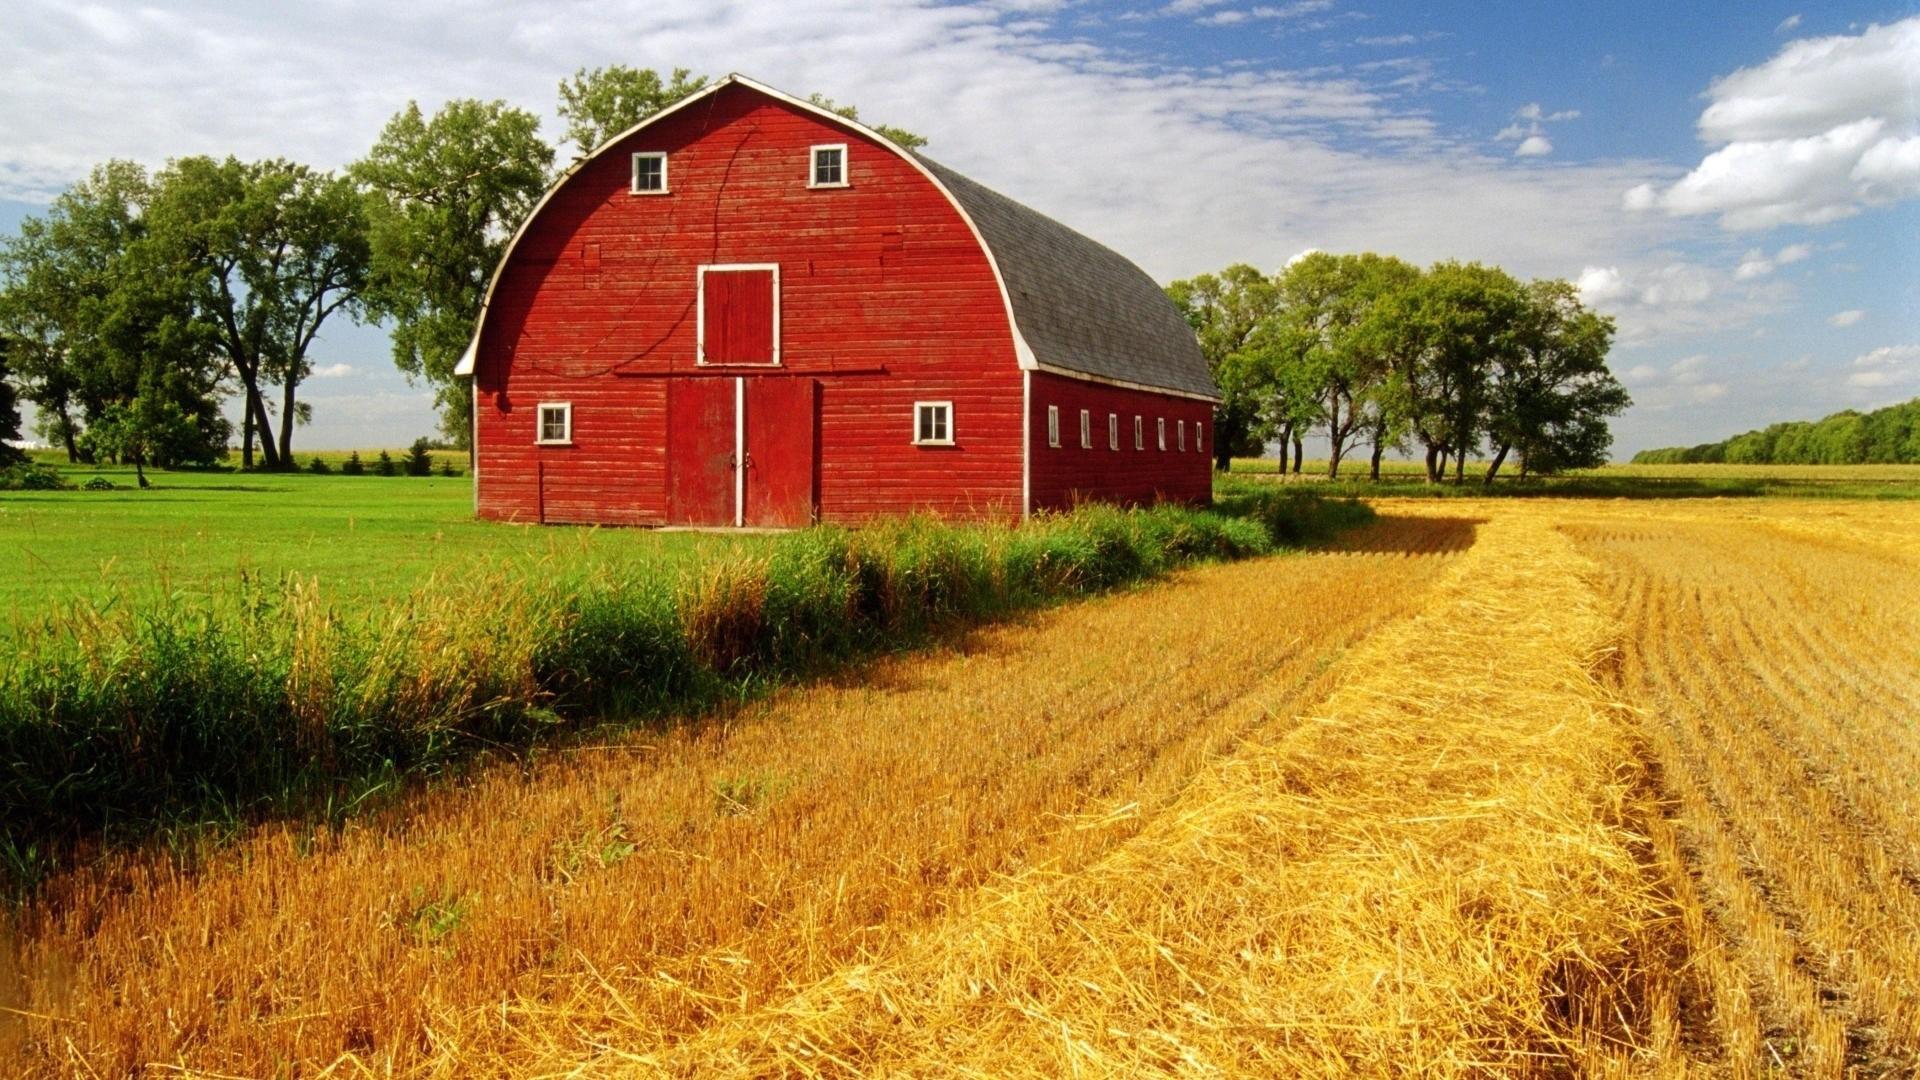 Farm Wallpaper for pc